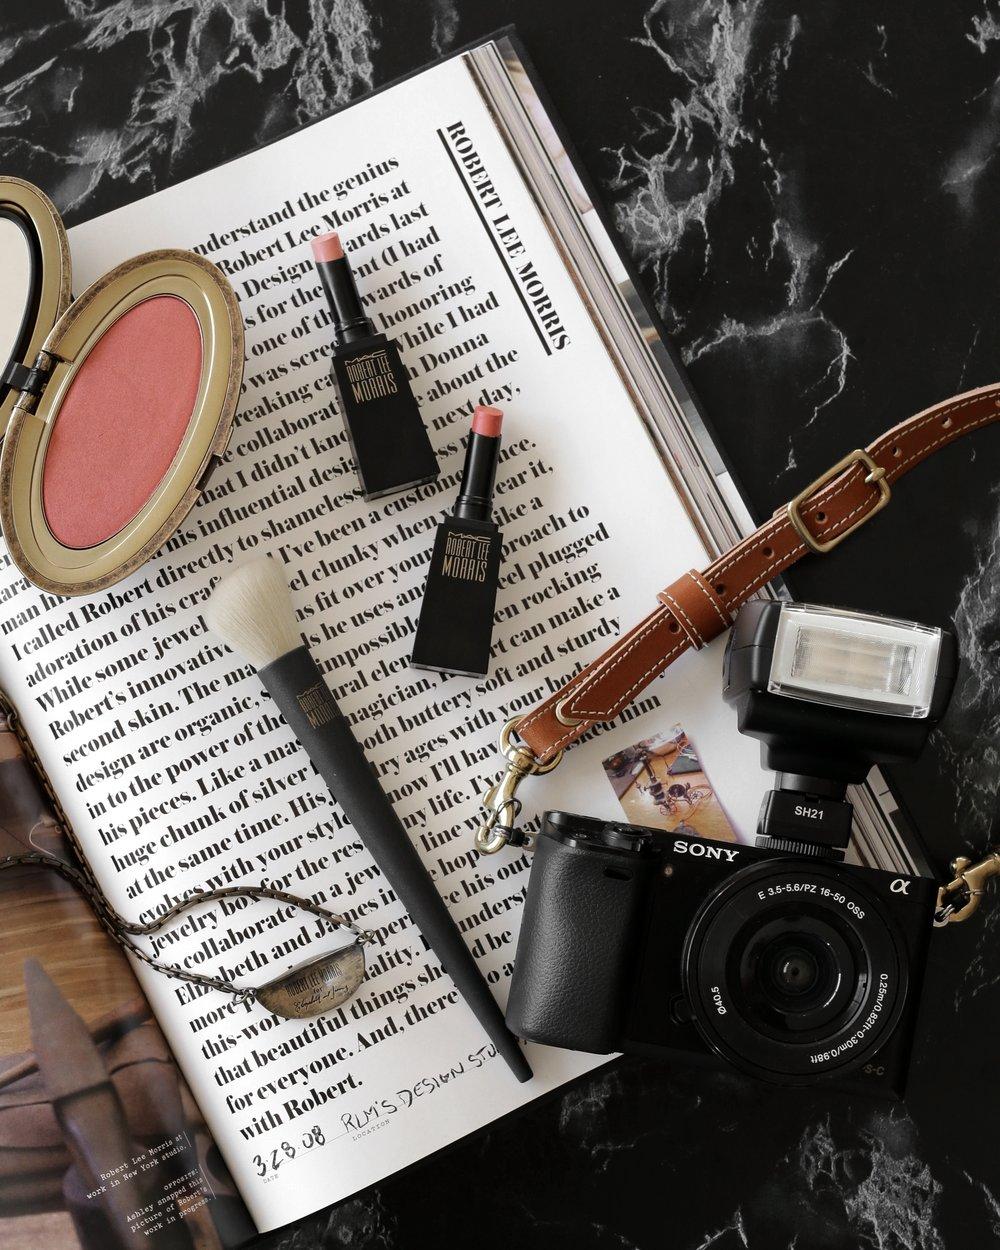 MAC x Robert Lee Morris makeup collection 2017 lipstick, blush, powder, compact, brush, beauty_5588.jpg